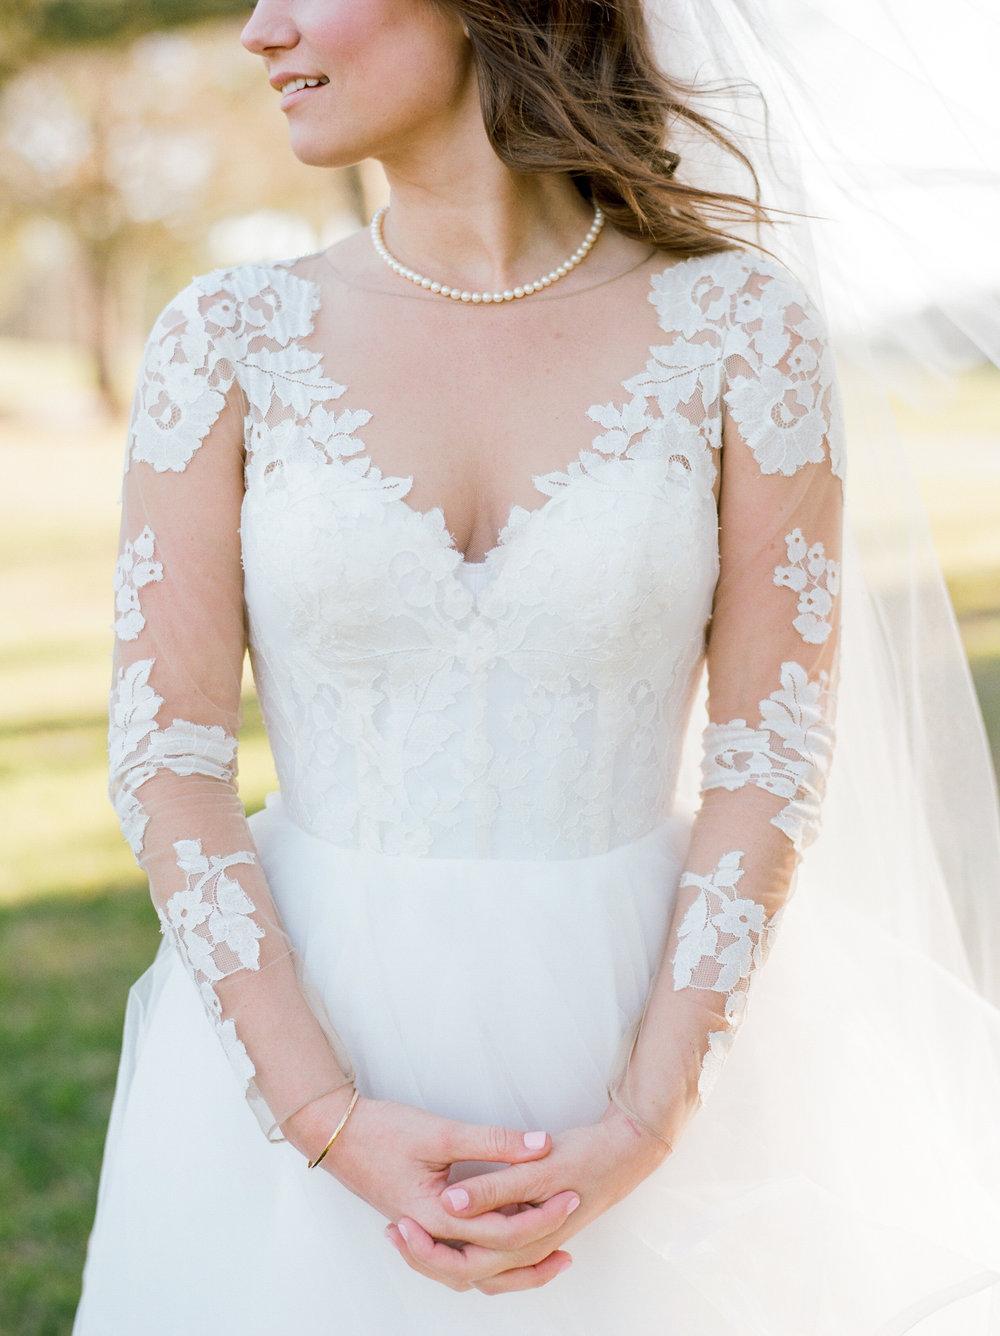 Houston-Wedding-Photographer-Style-Me-Pretty-St-Anne-Catholic-Church-Wedding-The-Woodlands-Country-Club-Palmer-Course-Austin-Wedding-photographer-fine-art-film-18.jpg